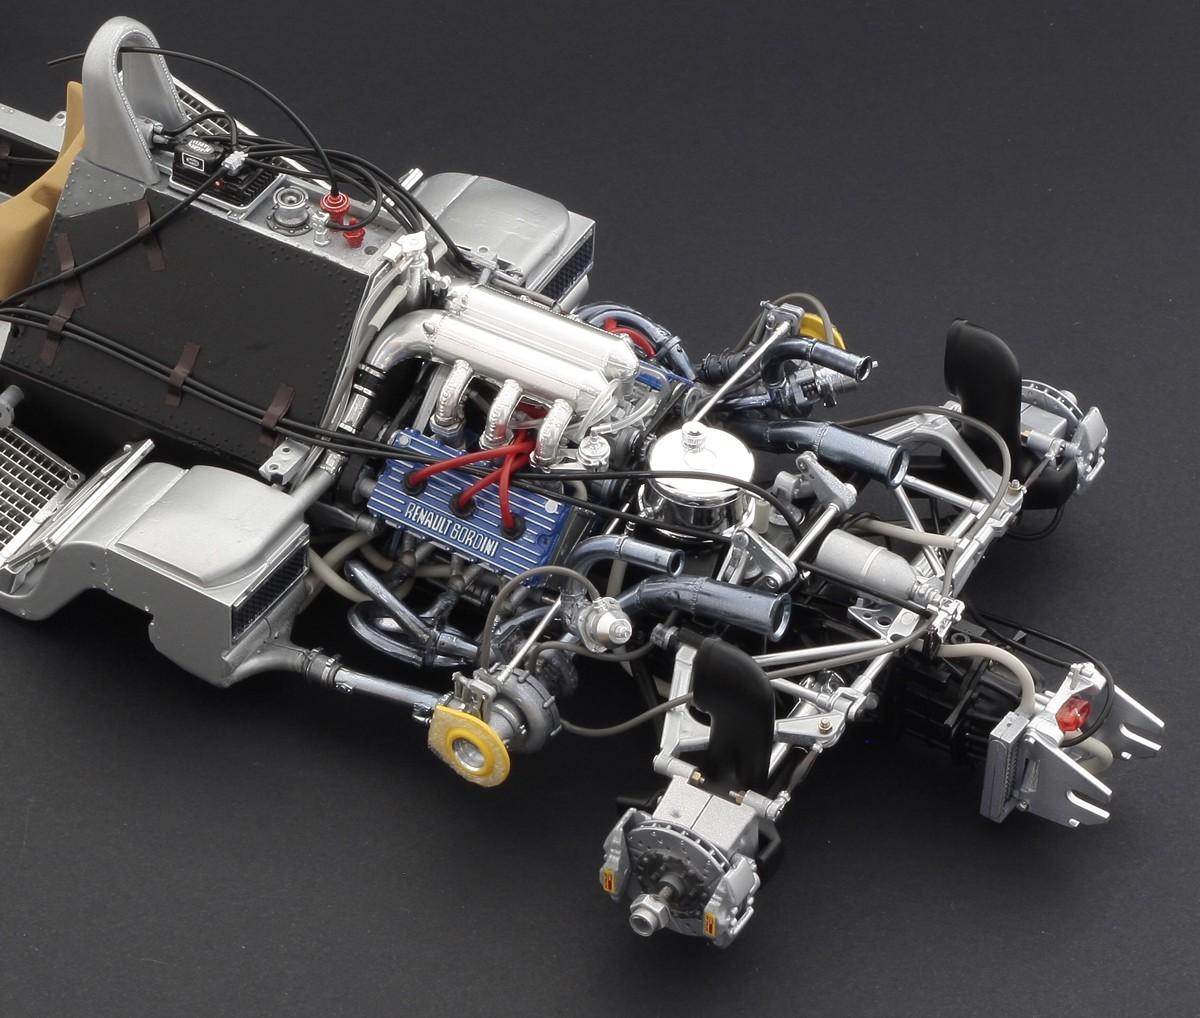 Italeri 1/12 RENAULT RE 20 Turbo # 4707